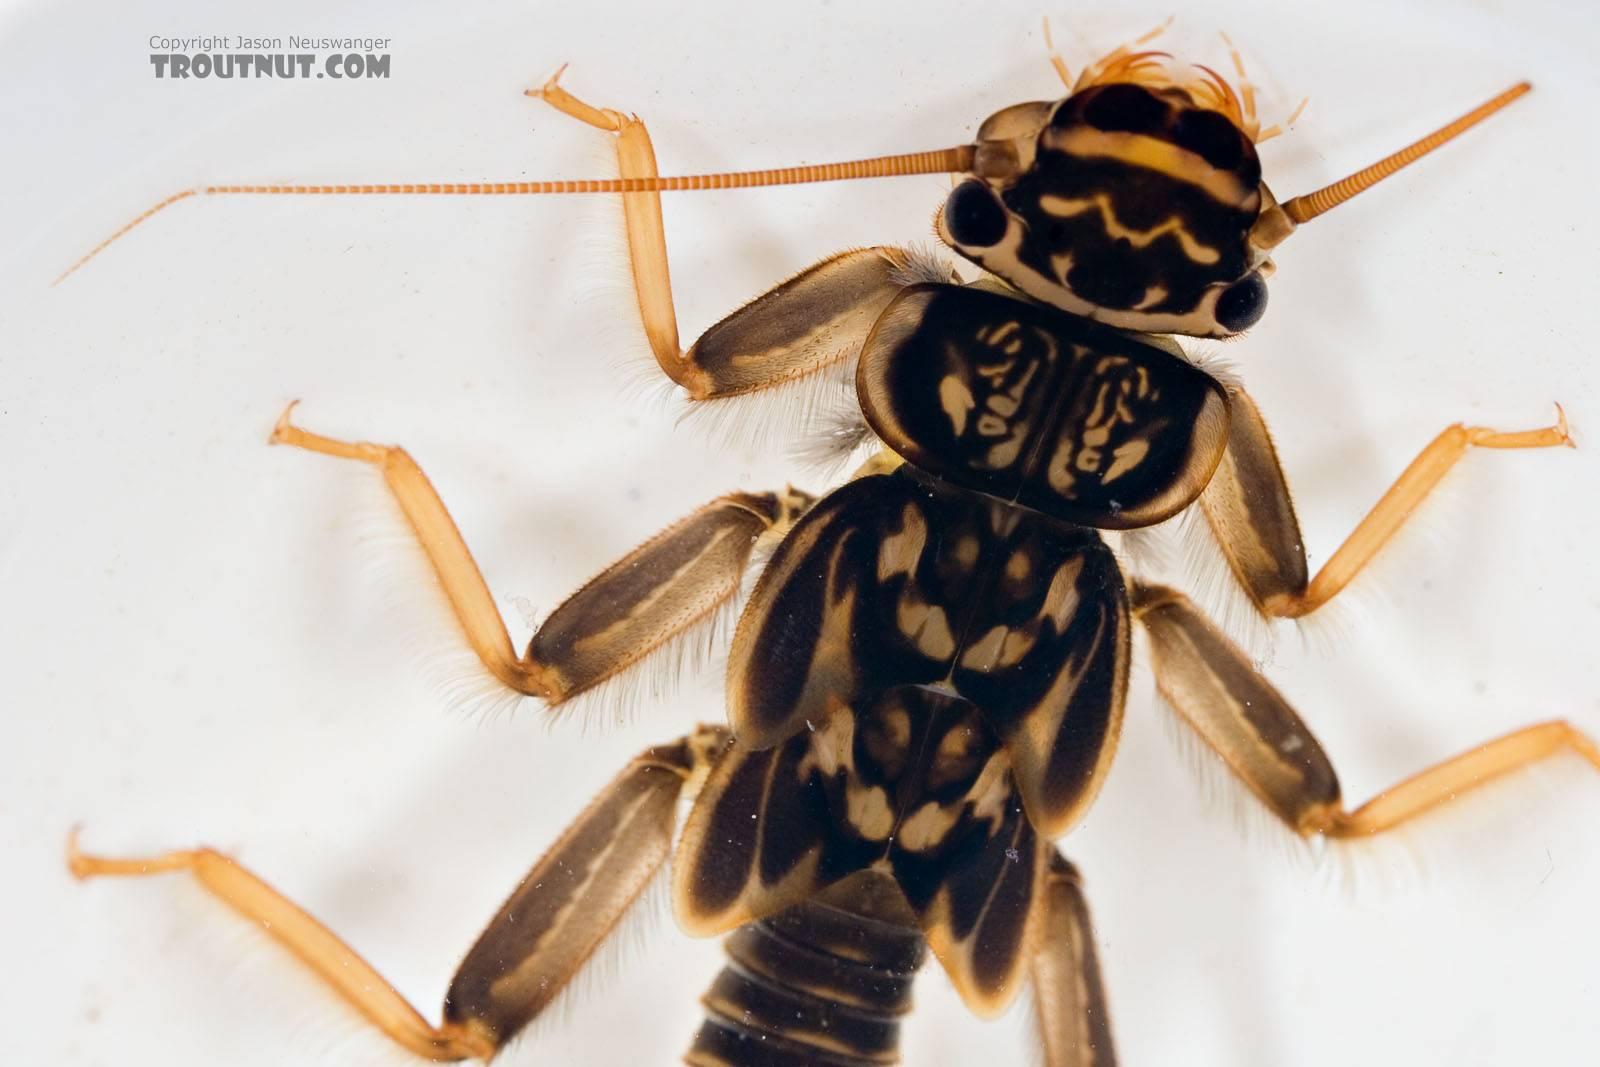 Acroneuria abnormis (Golden Stone) Stonefly Nymph from Paradise Creek in Pennsylvania